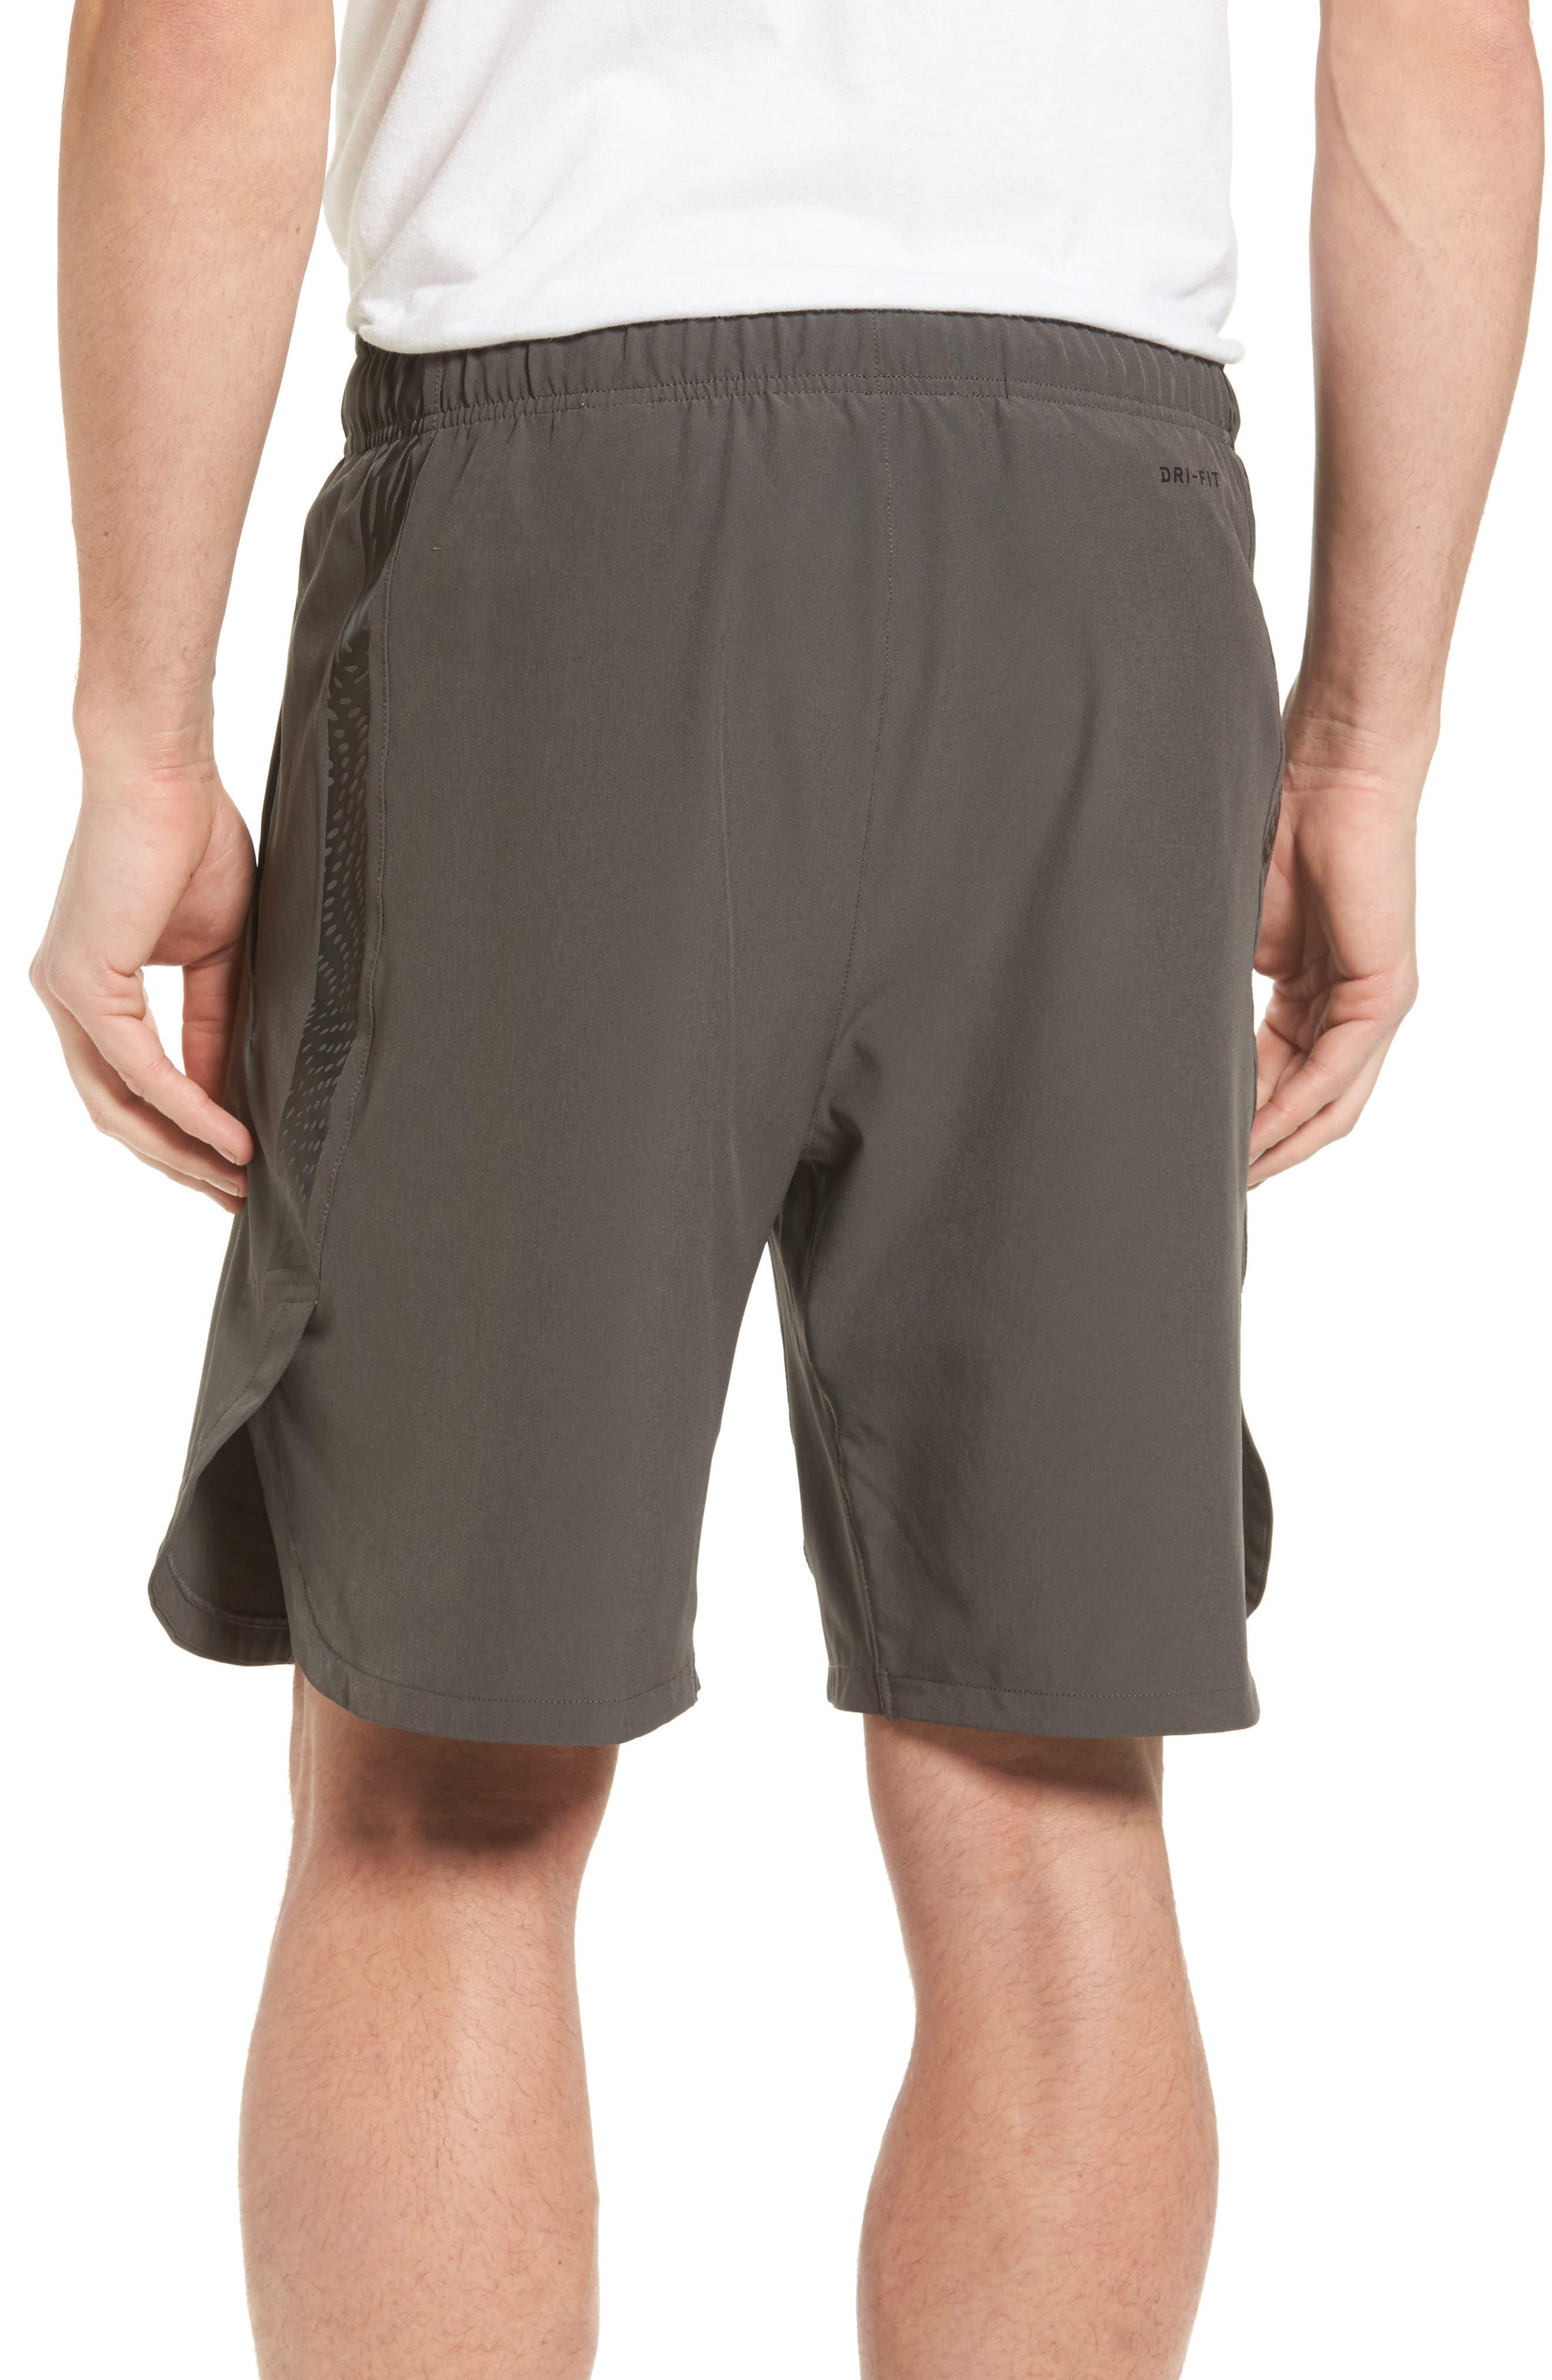 Flex Training Shorts,                             Alternate thumbnail 4, color,